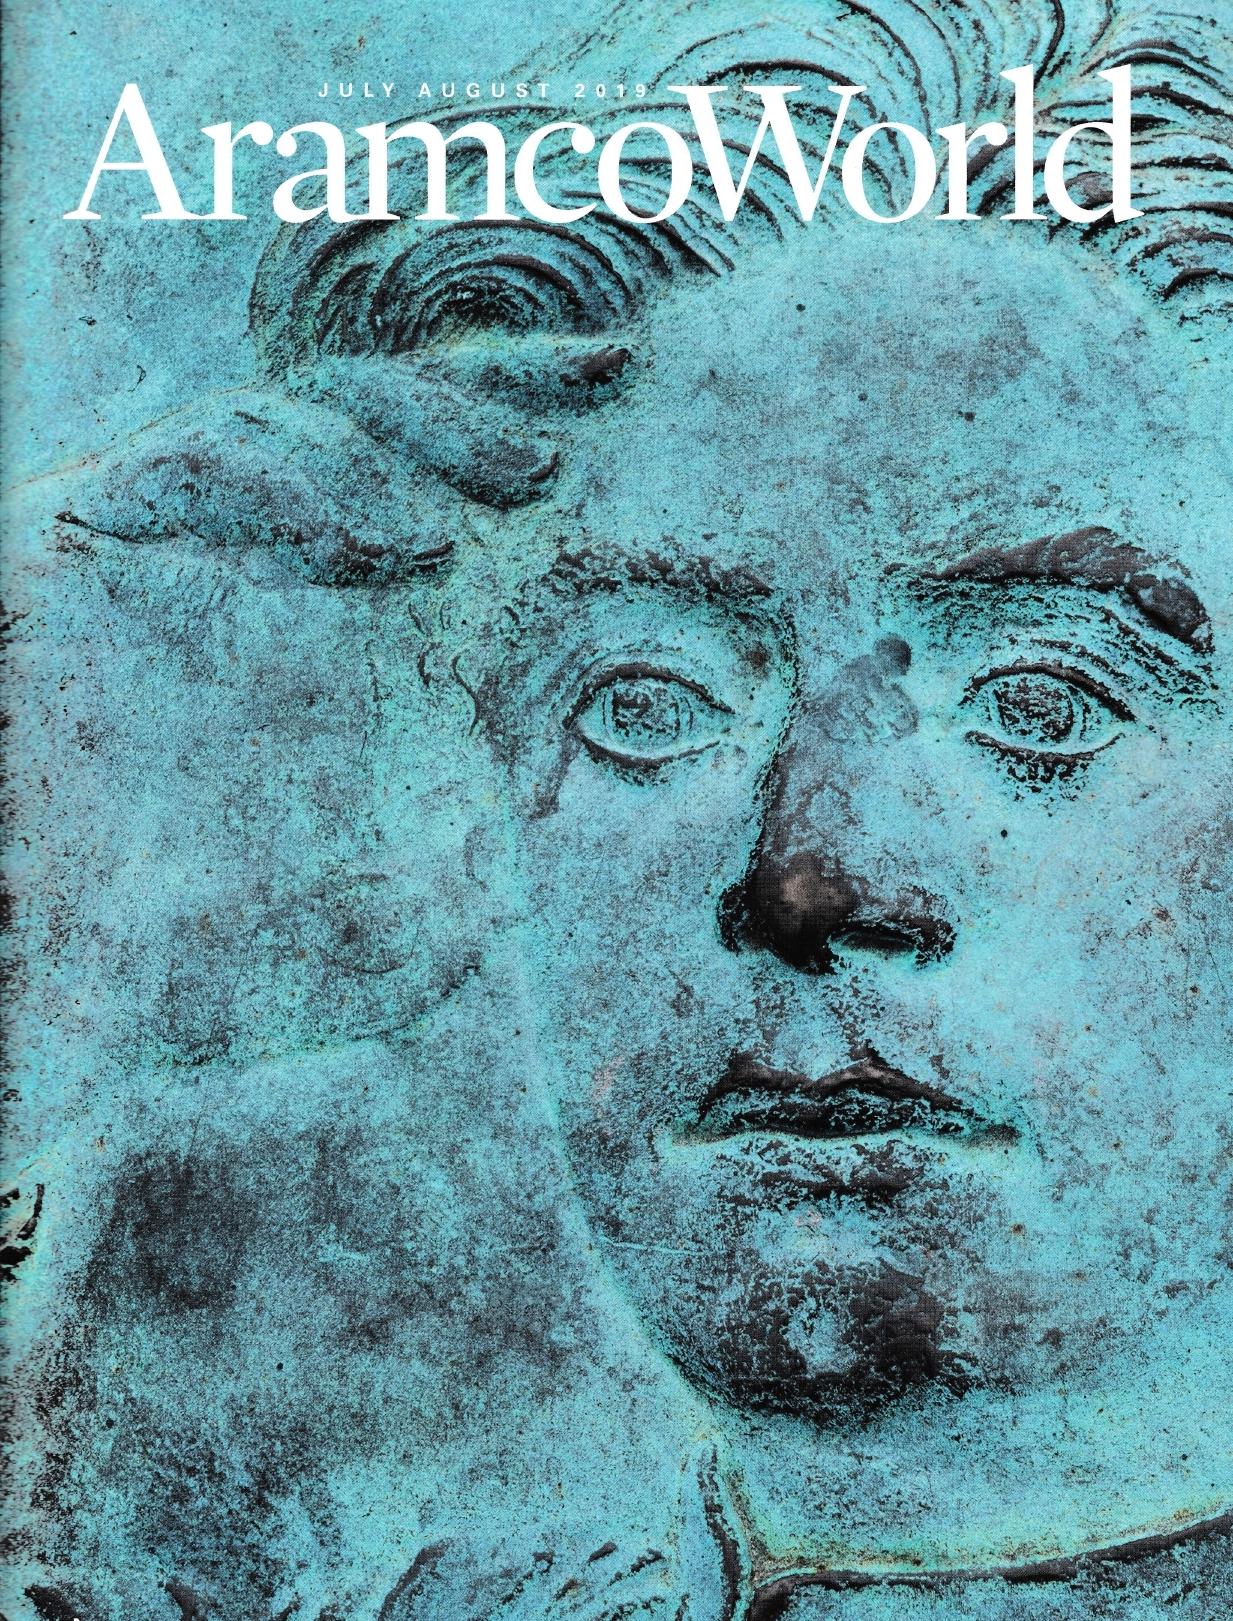 Piney Kesting, The Borderless Worlds of Kahlil Gibran, Aramco World Magazine, July-August 2019, pp. 28-38.